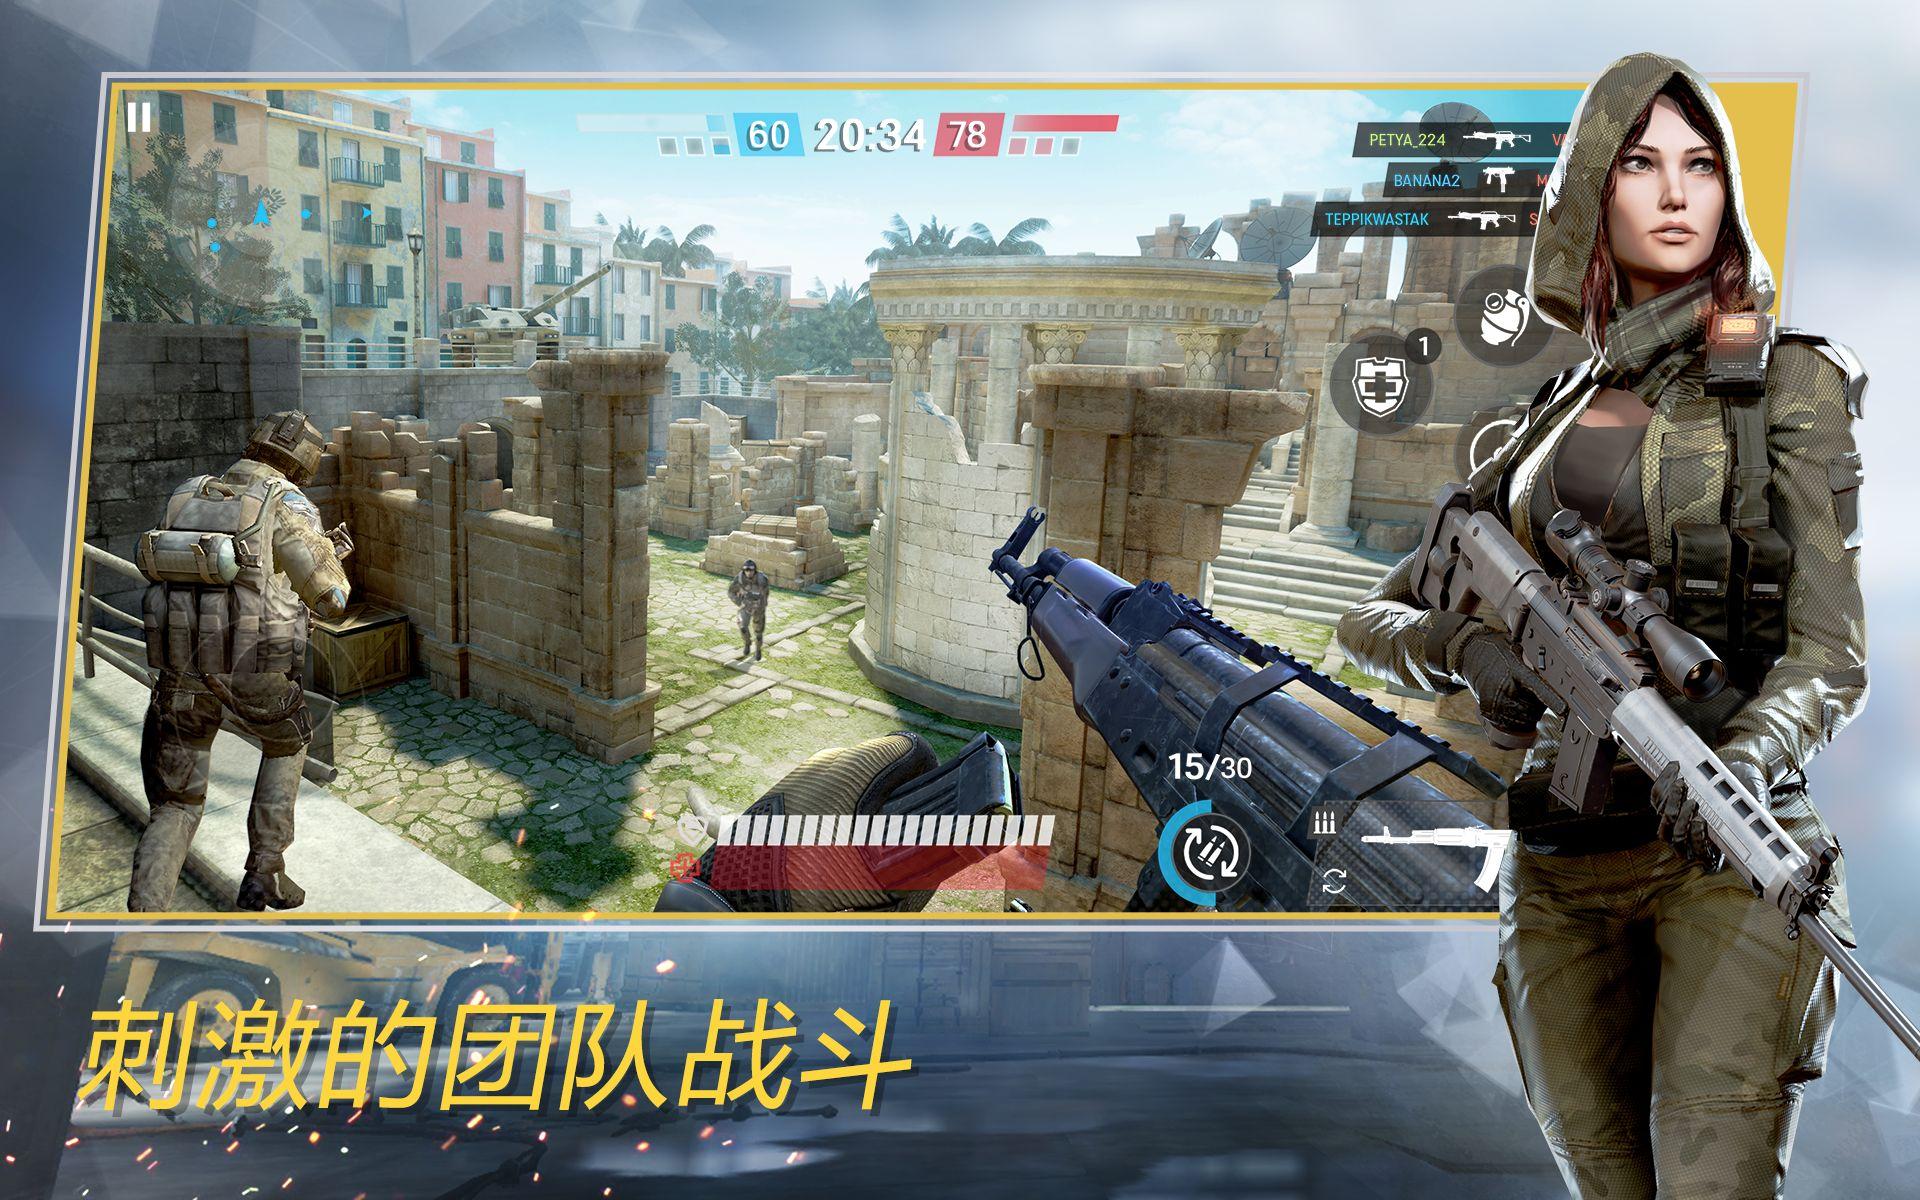 Warface: Global Operations: 第一人称动作射击游戏 游戏截图1